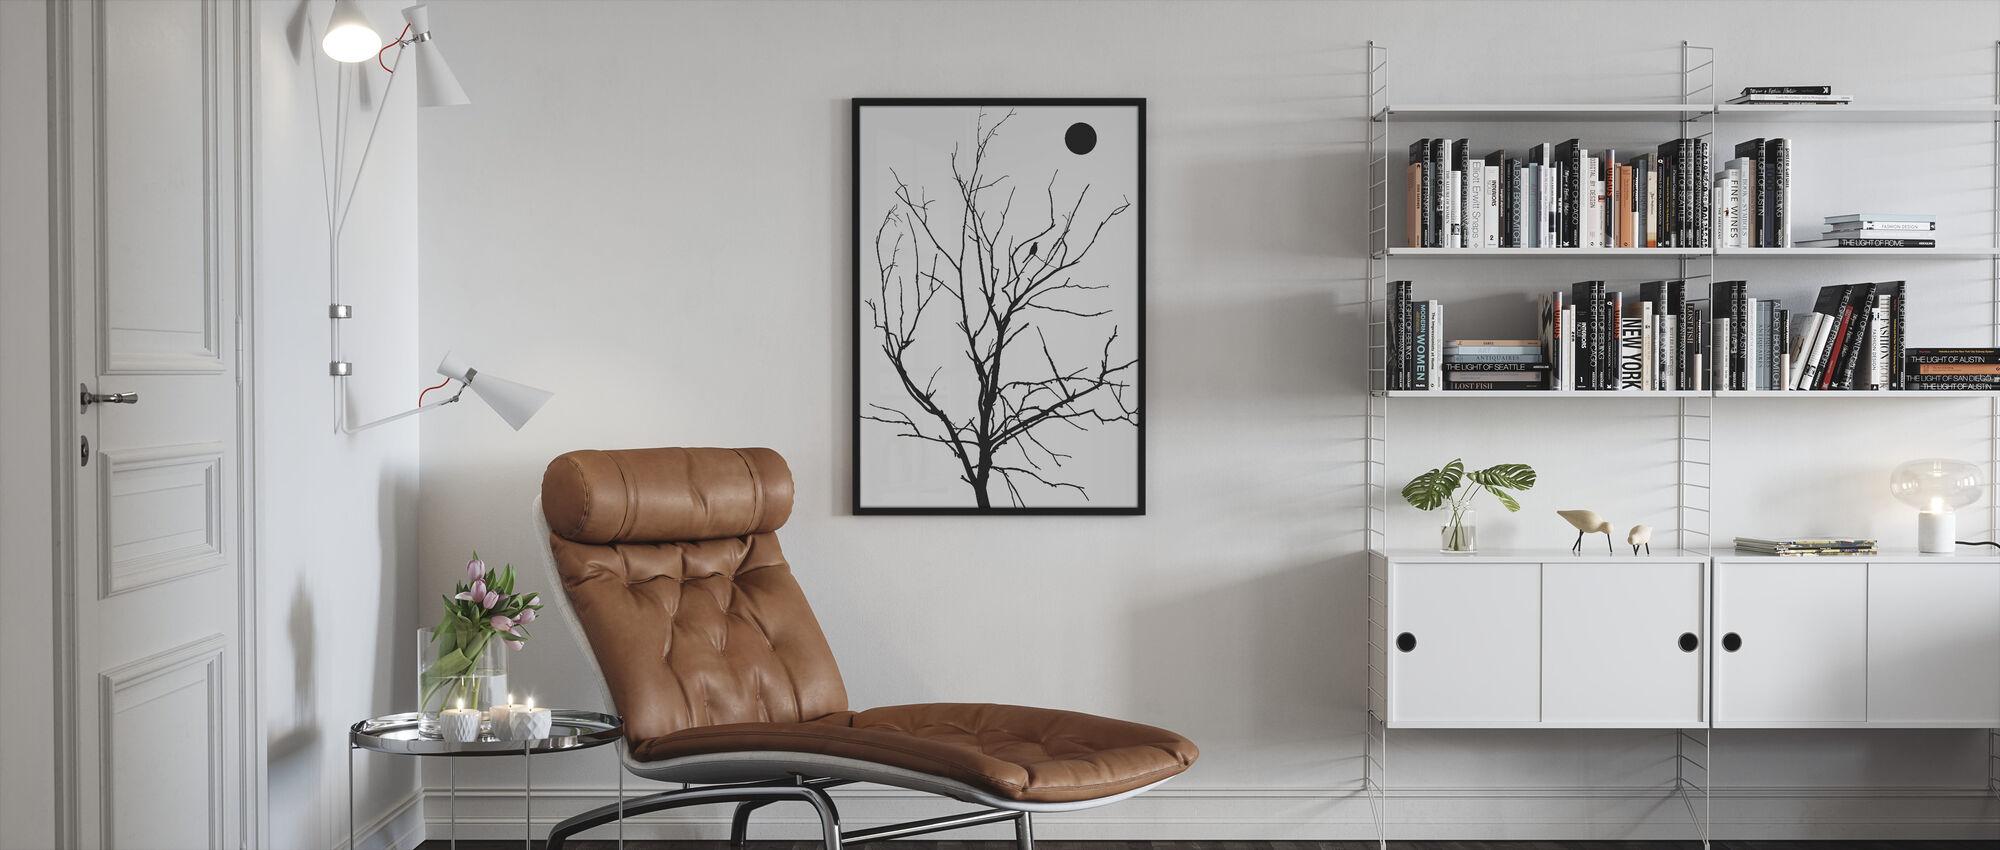 Lonely Bird Day Sun - Framed print - Living Room